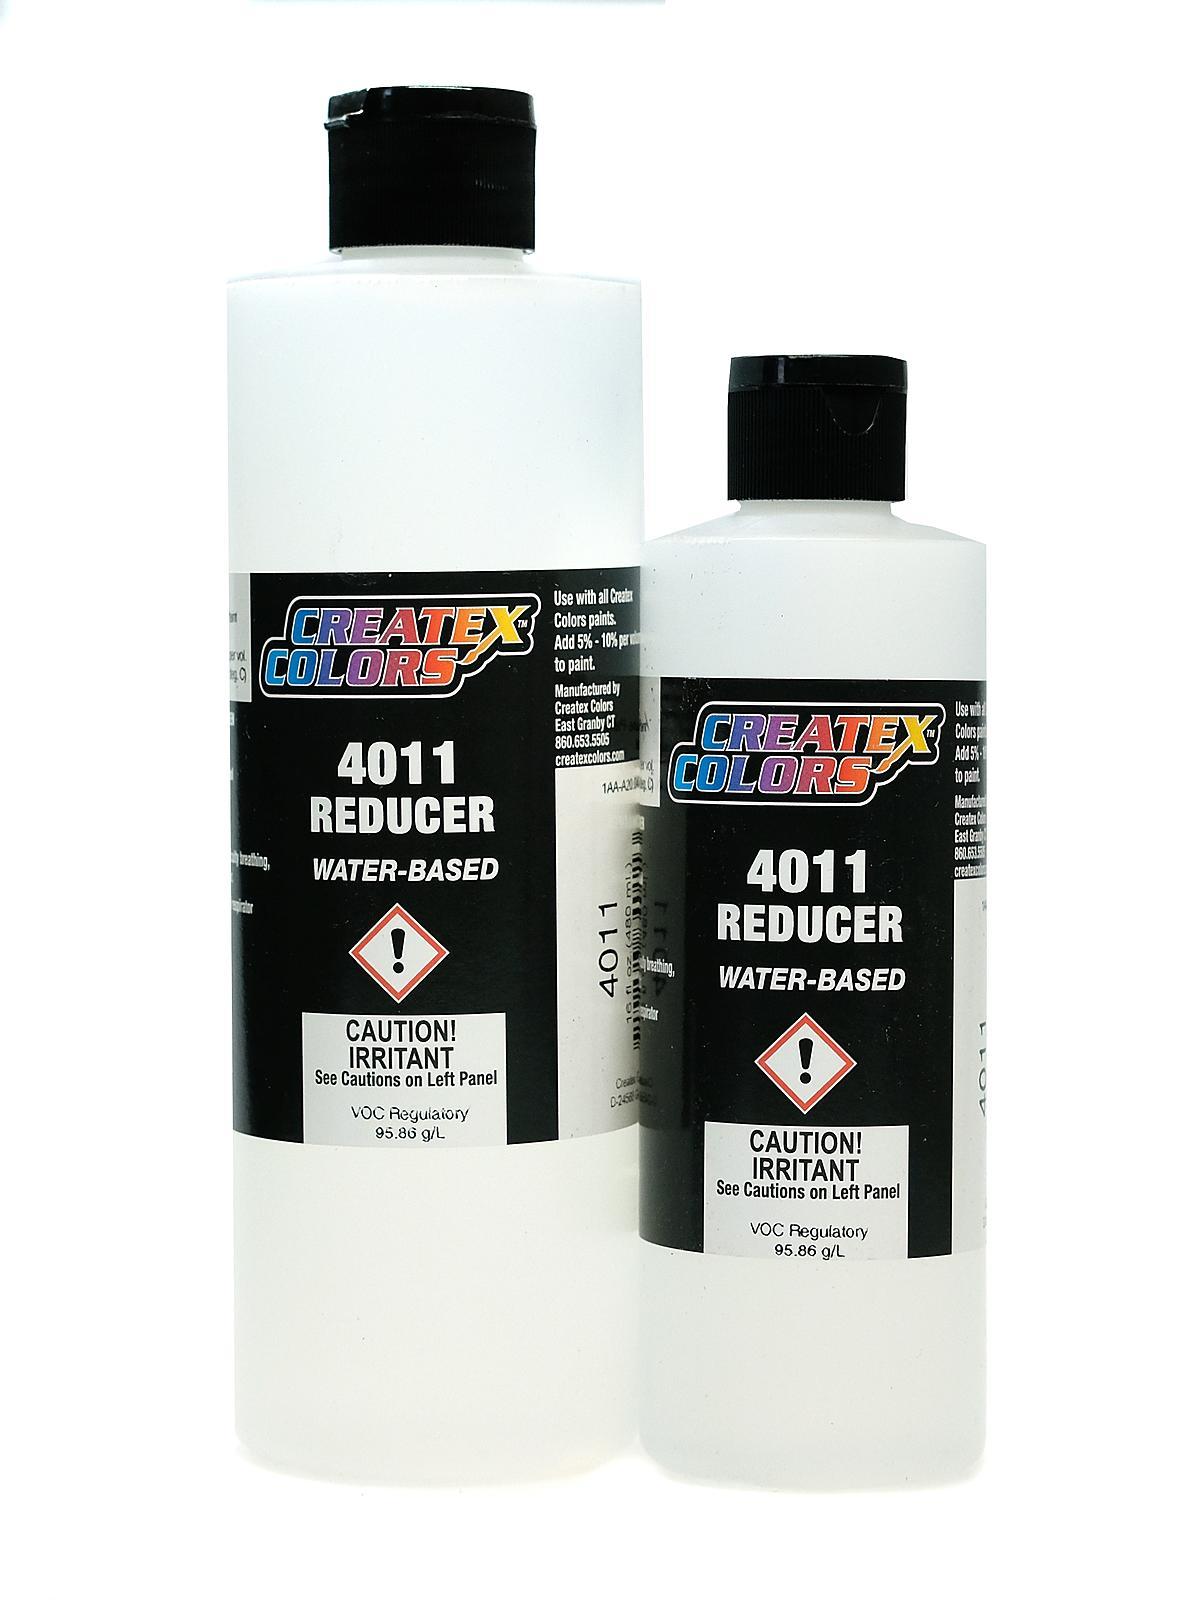 4011 Reducer